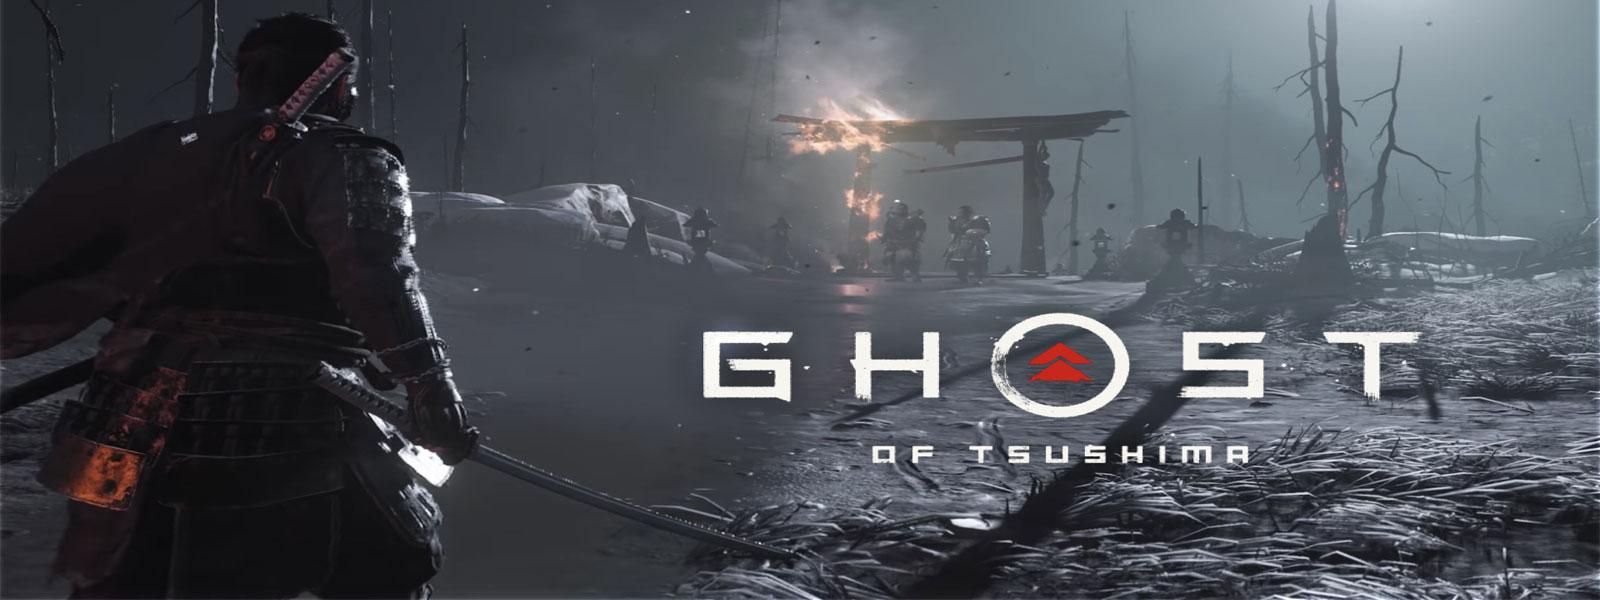 ghost of tsushima itecnoshop